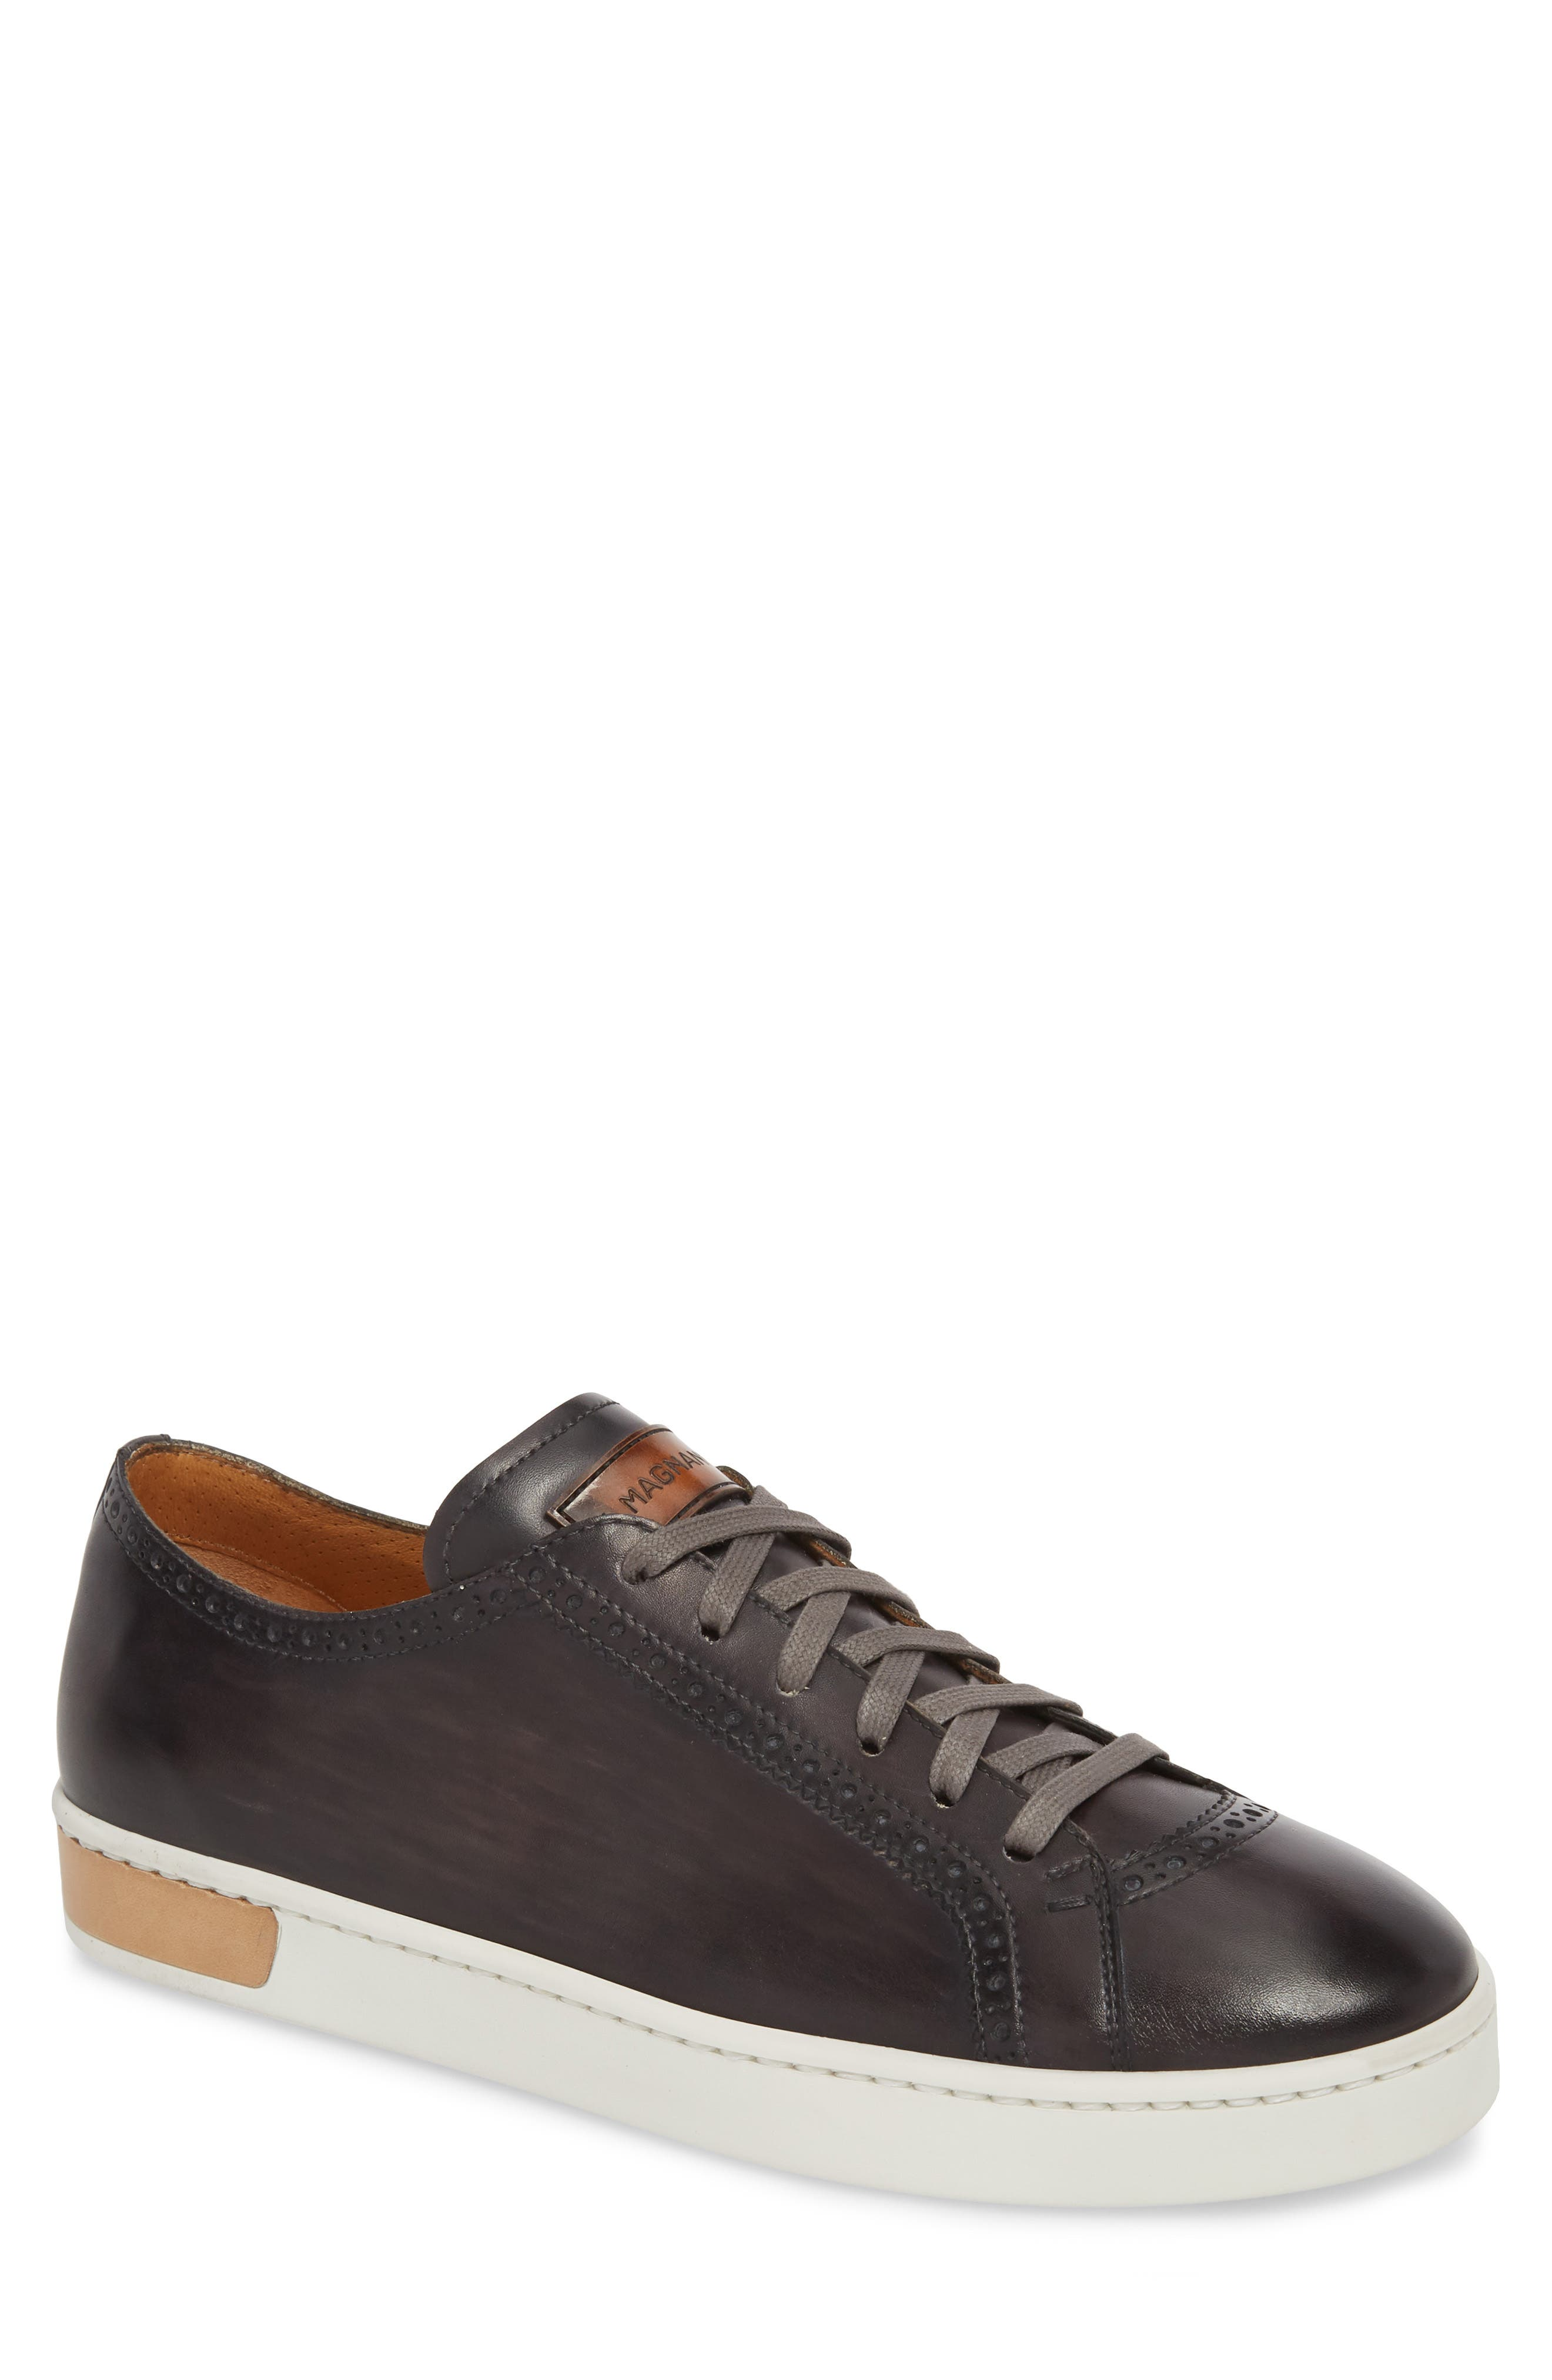 MAGNANNI Juniper Brogued Low Top Sneaker, Main, color, 020